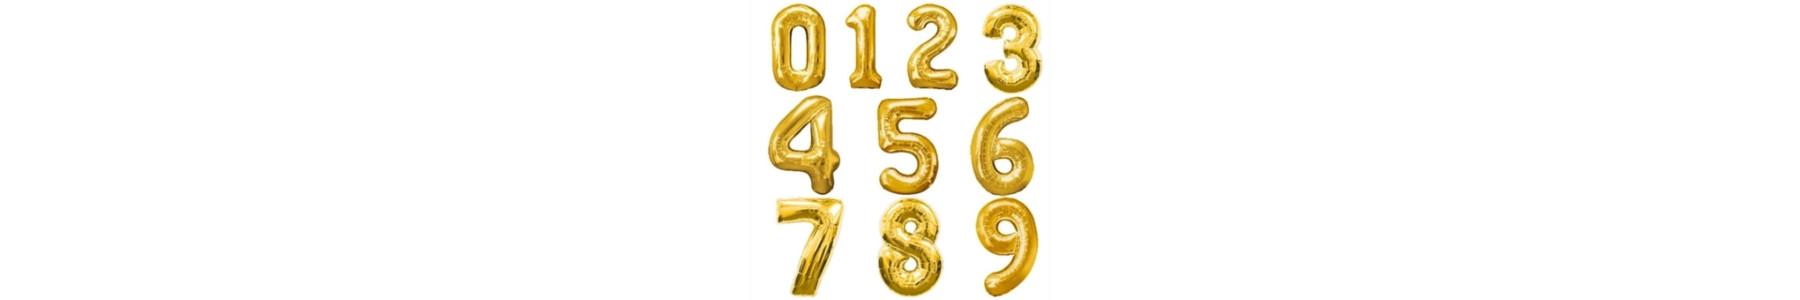 Baloane cifre aurii